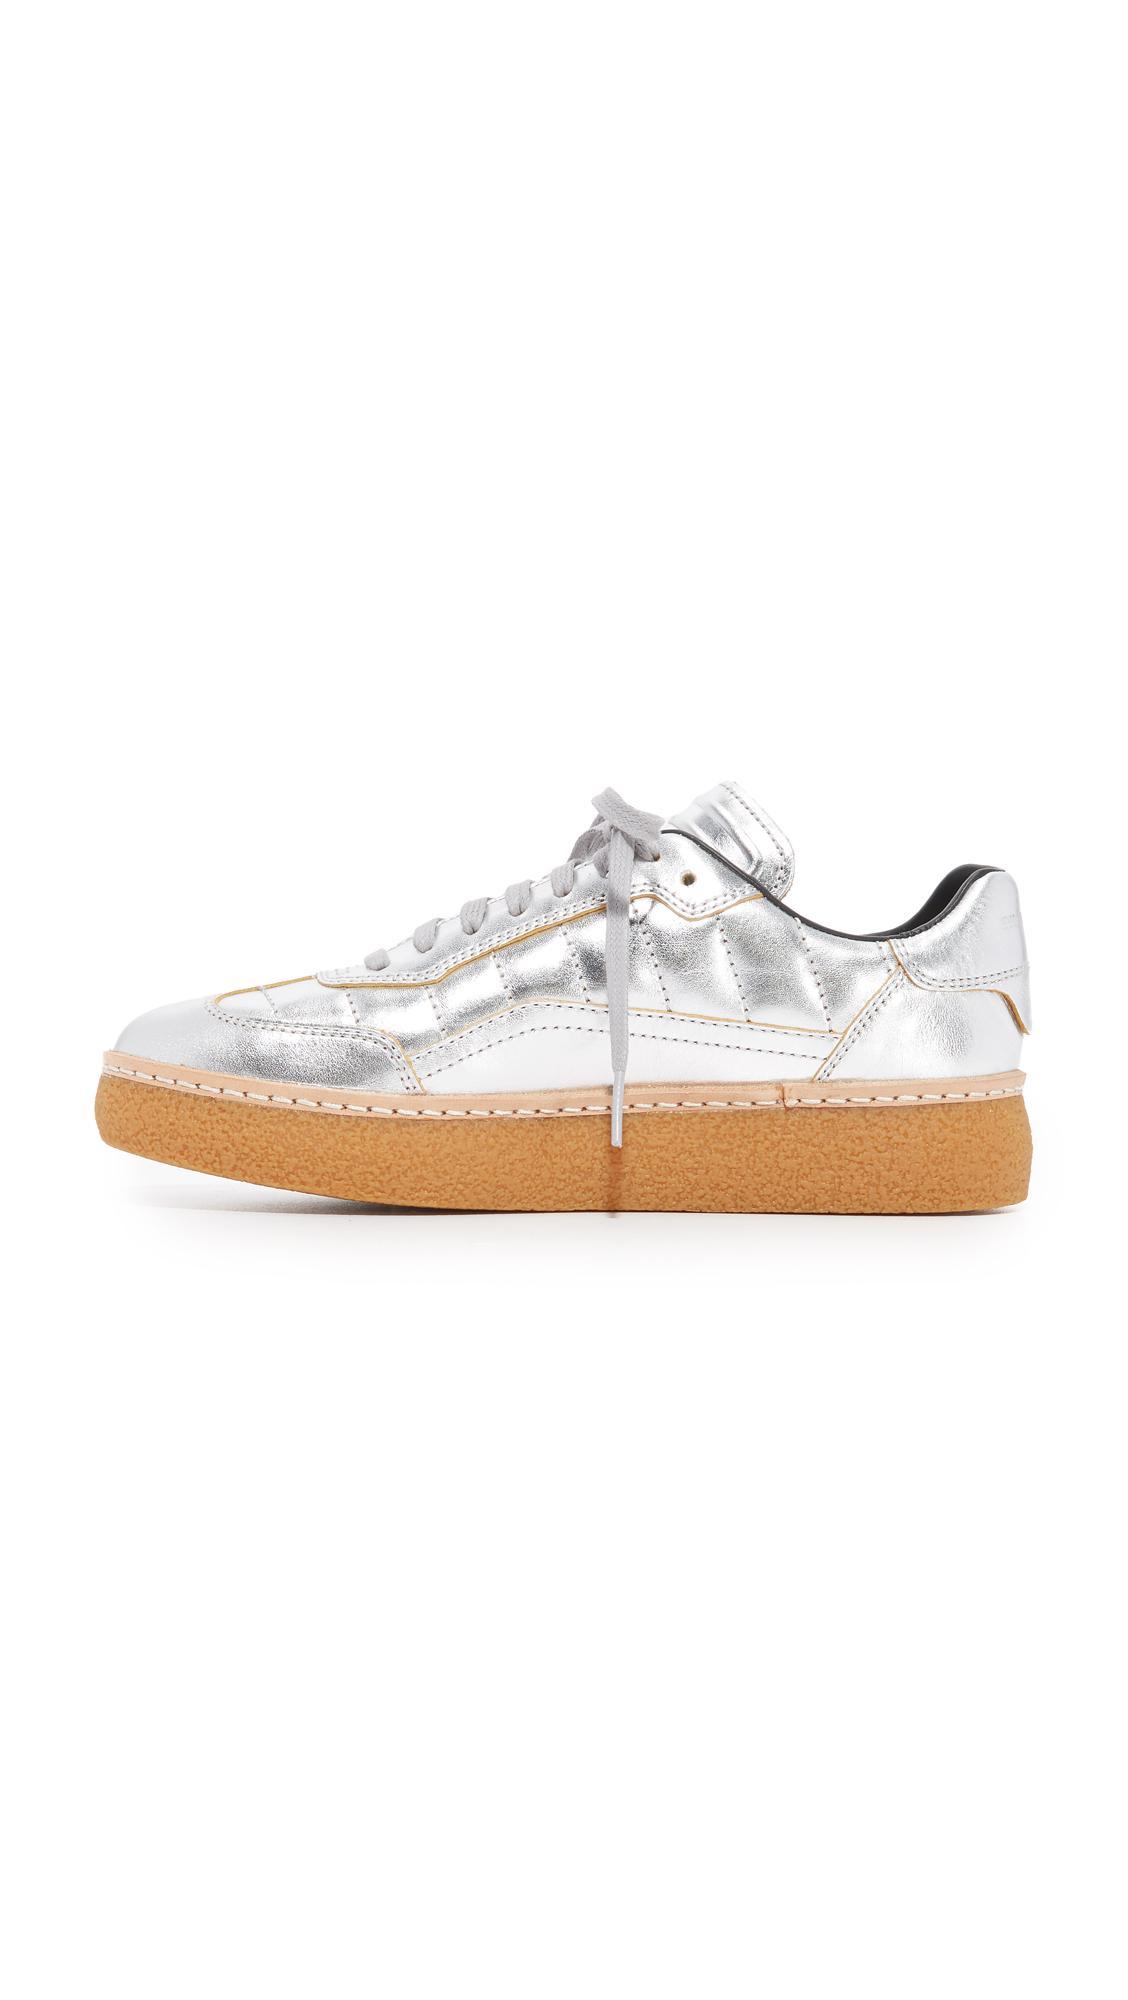 Alexander Wang Leather Eden Platform Sneakers in Silver (Metallic)